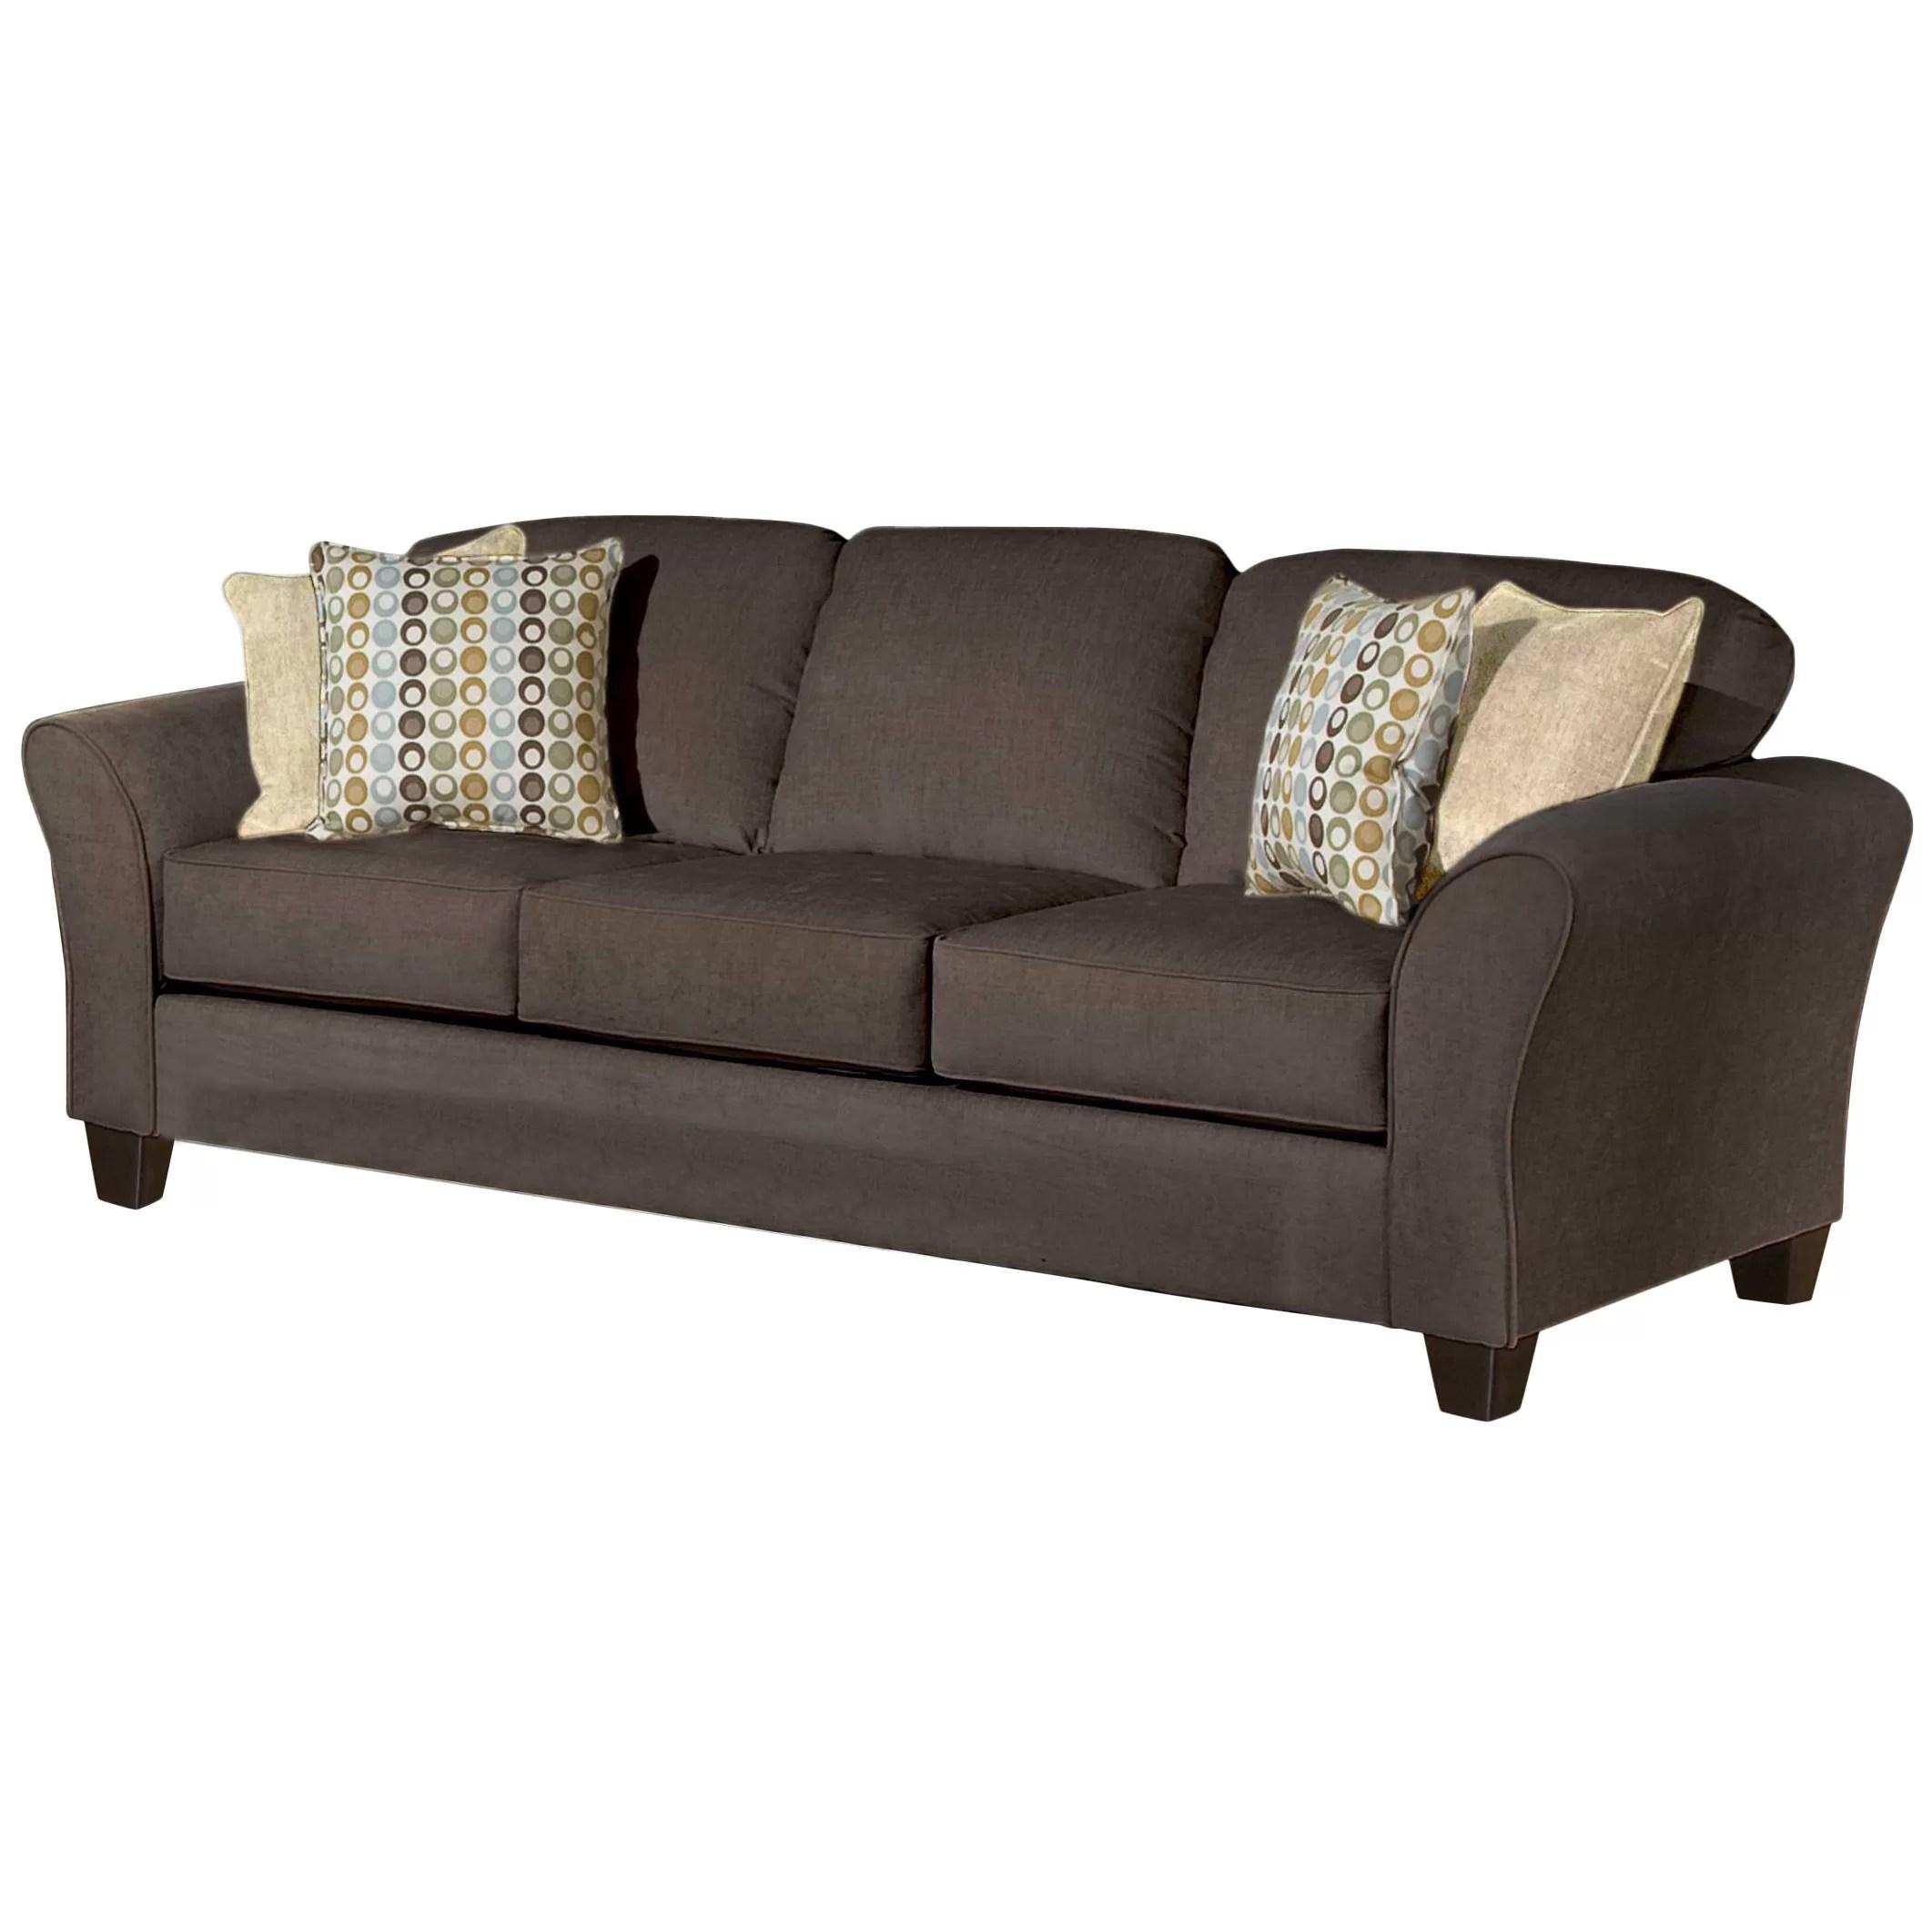 wayfair sofa reviews sleeper bunk bed three posts serta upholstery franklin and